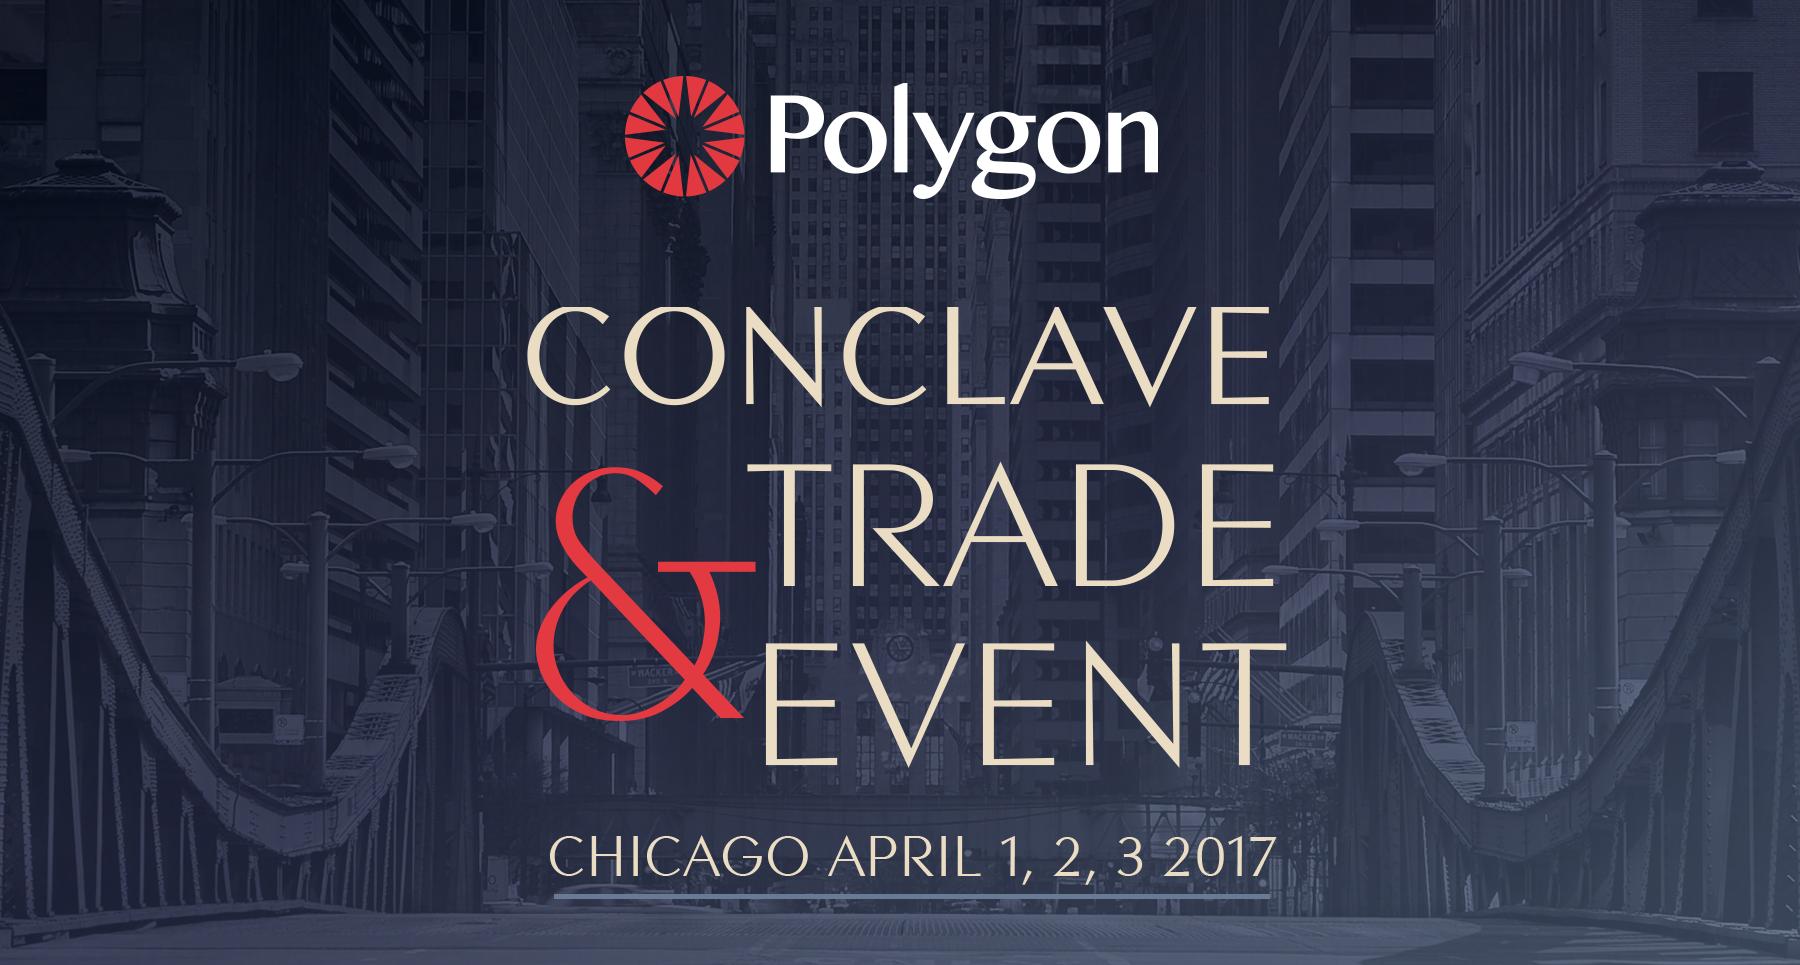 Chicago Il Polygon Conclave And Trade Event April 1 3 2018